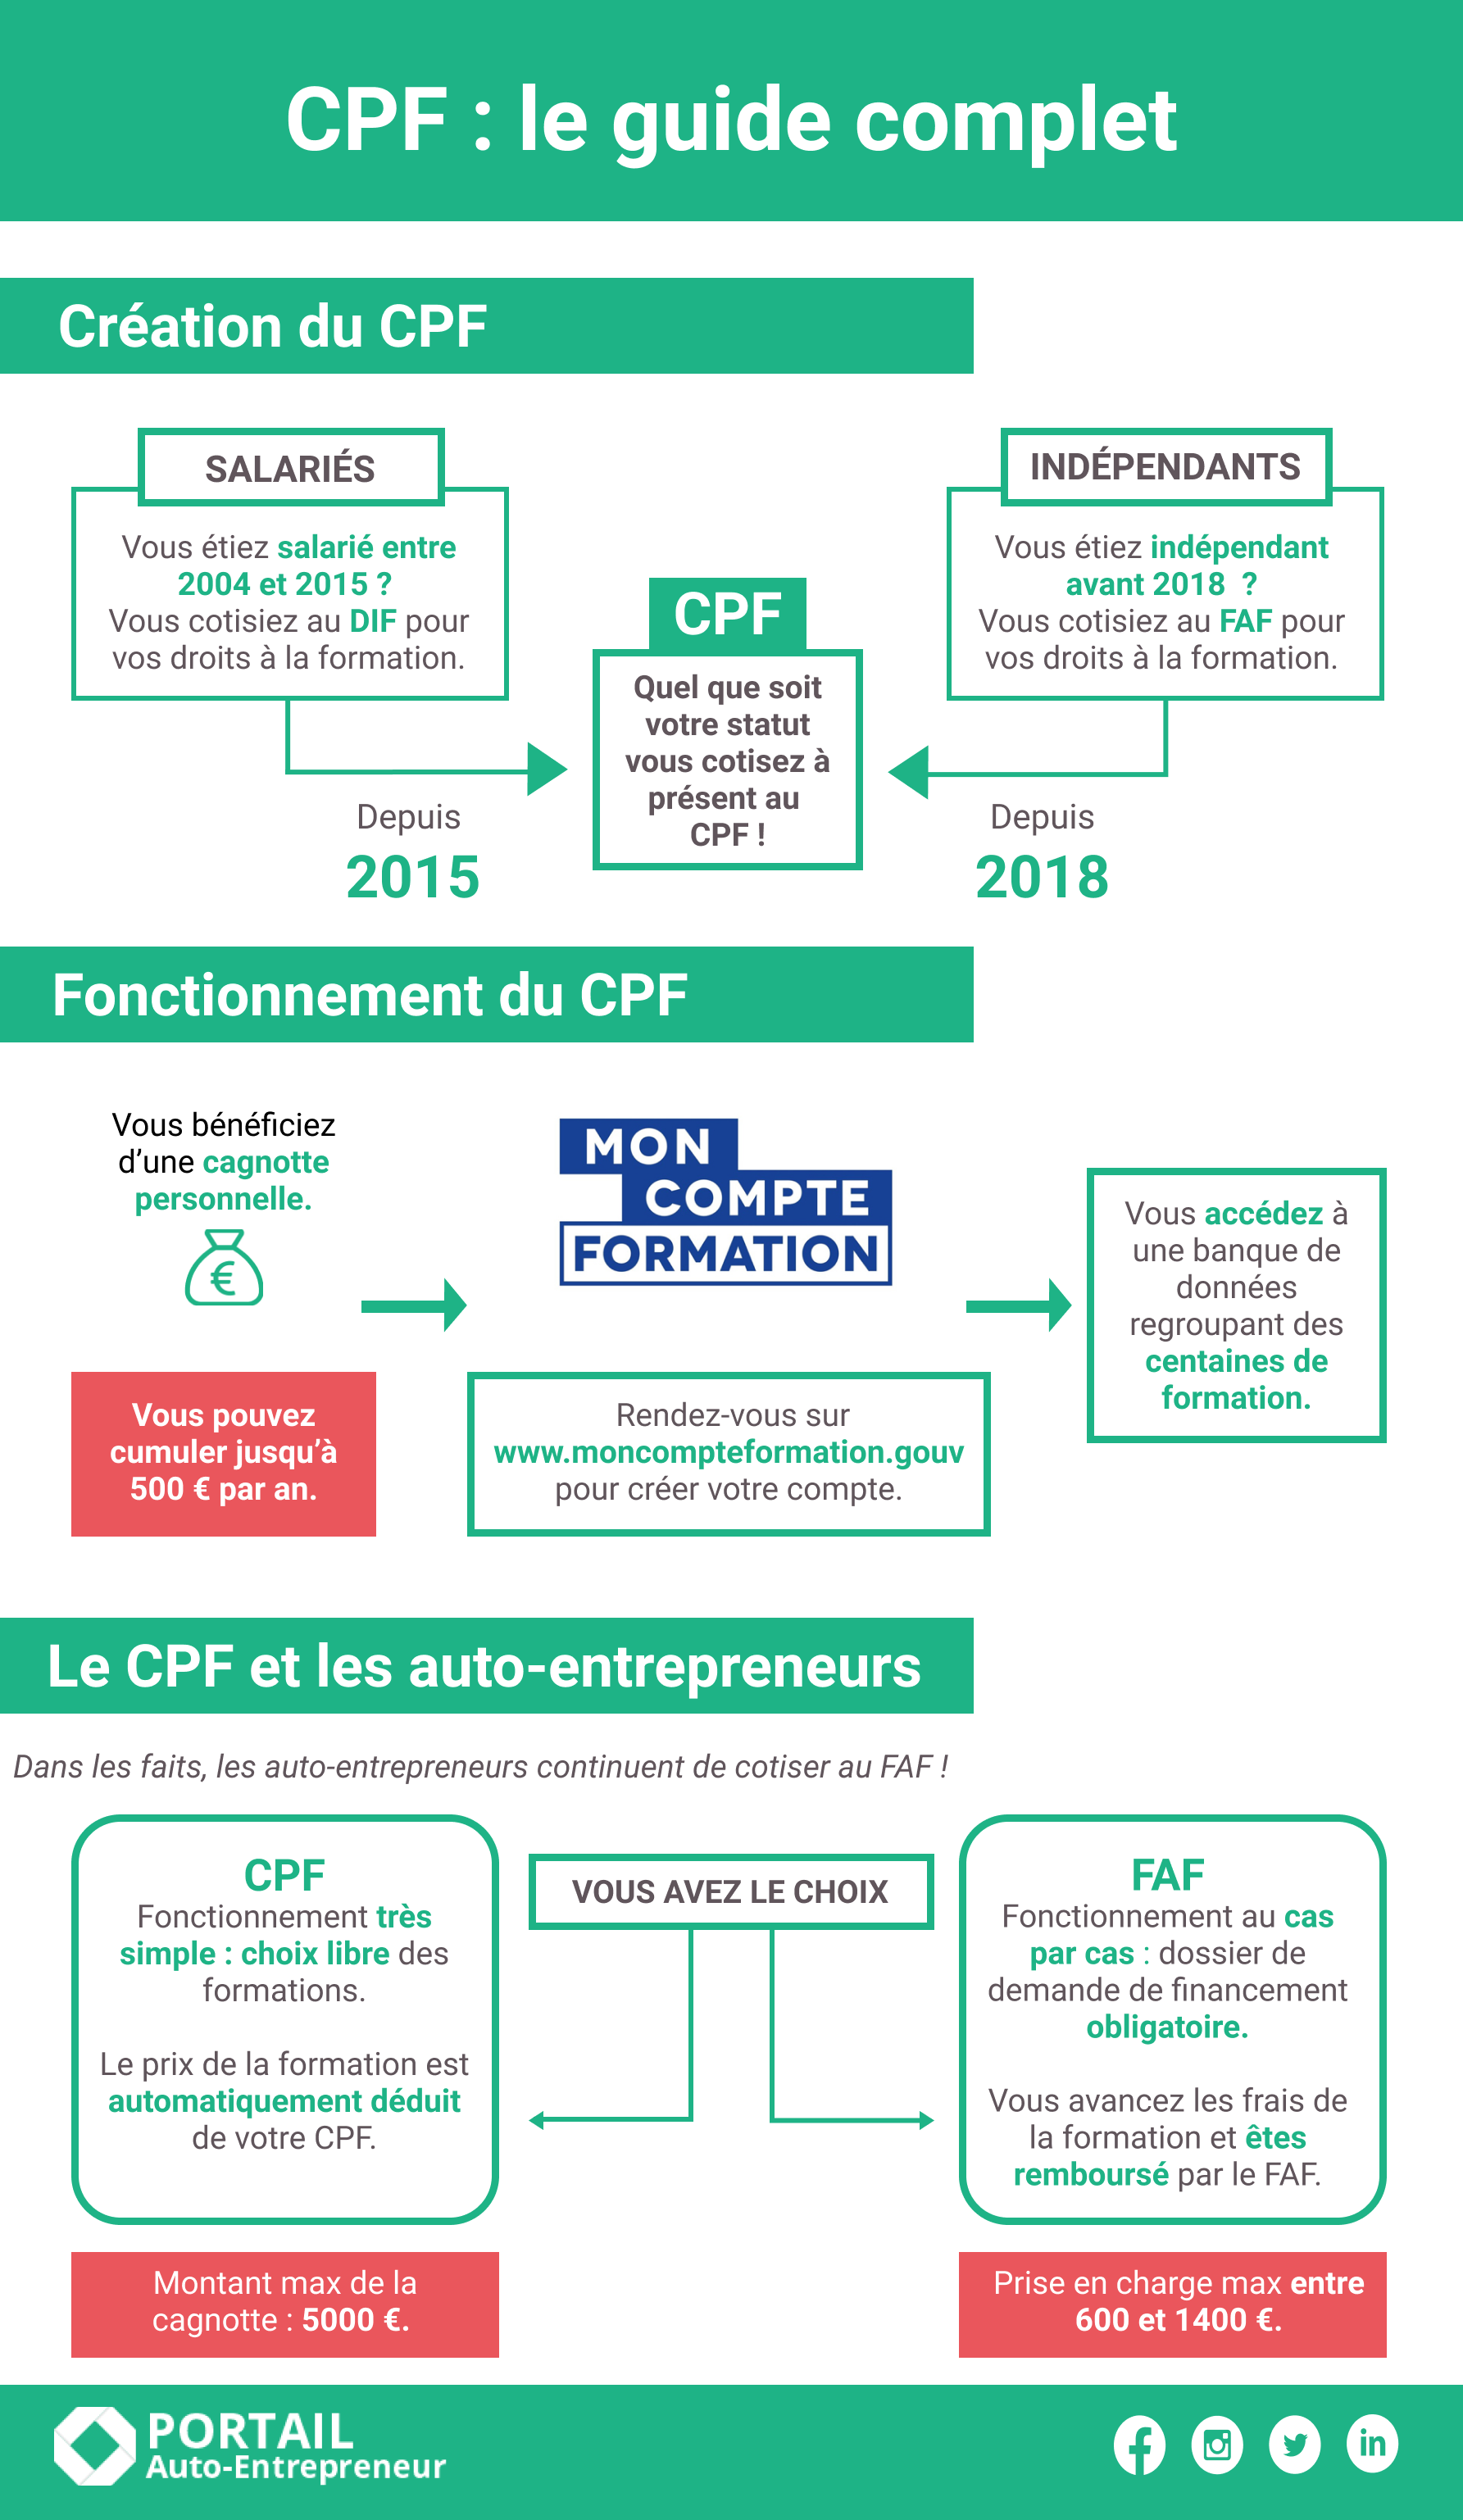 fonctionnement CPF